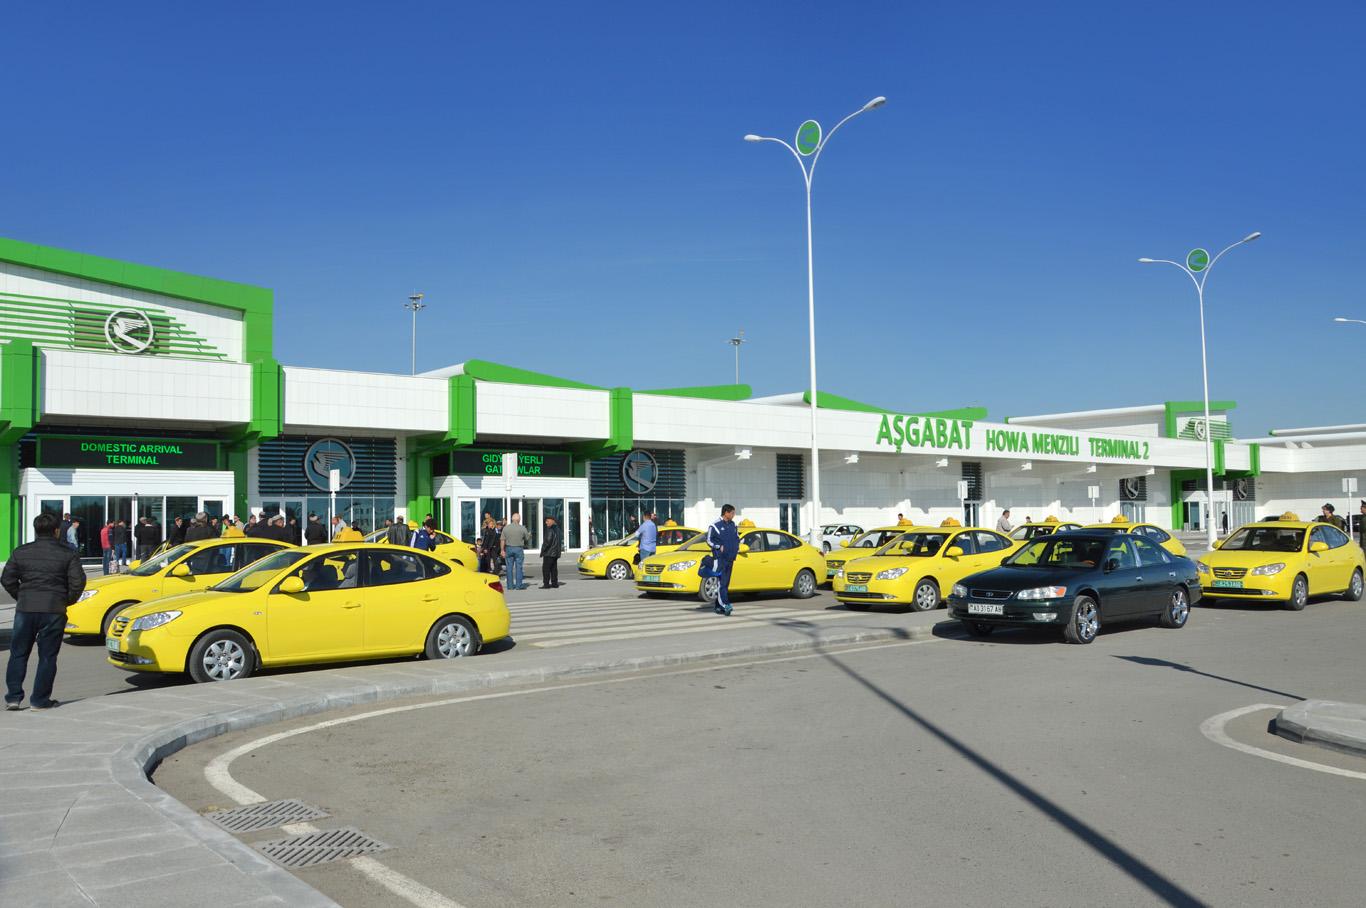 Official taxis at Ashgabat Airport